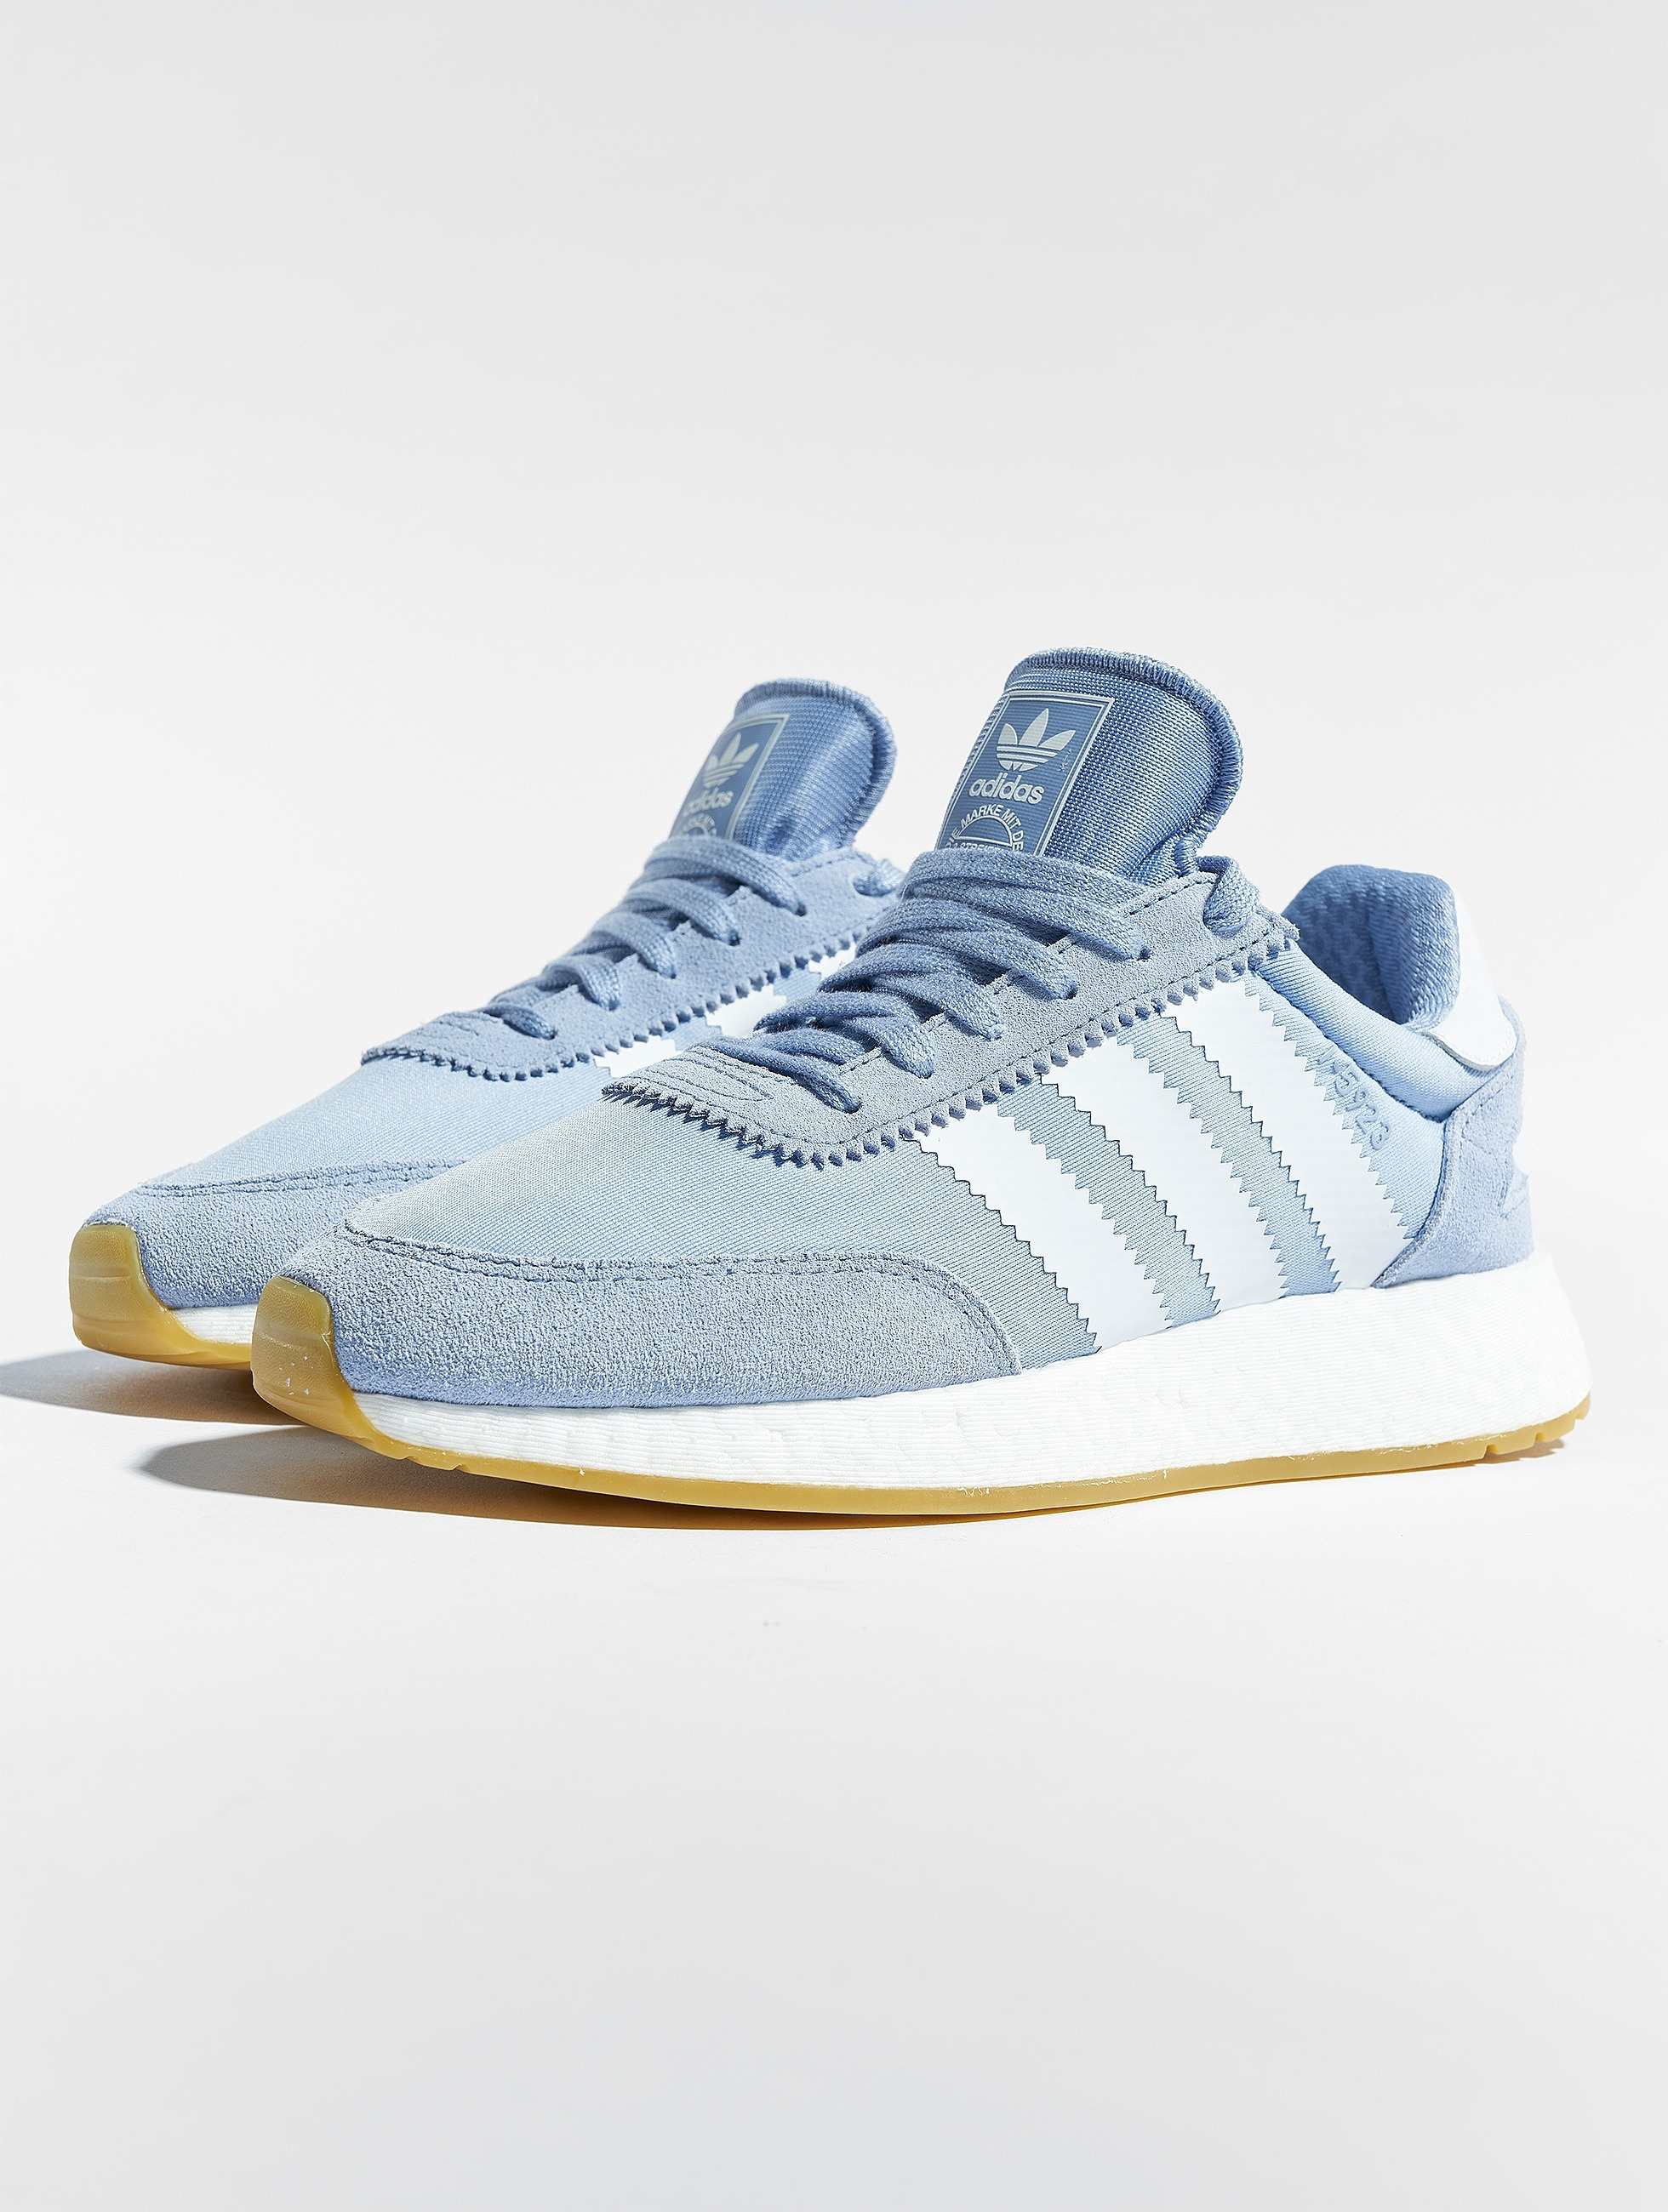 0a5b5fac112 adidas originals schoen / sneaker I-5923 in blauw 498622